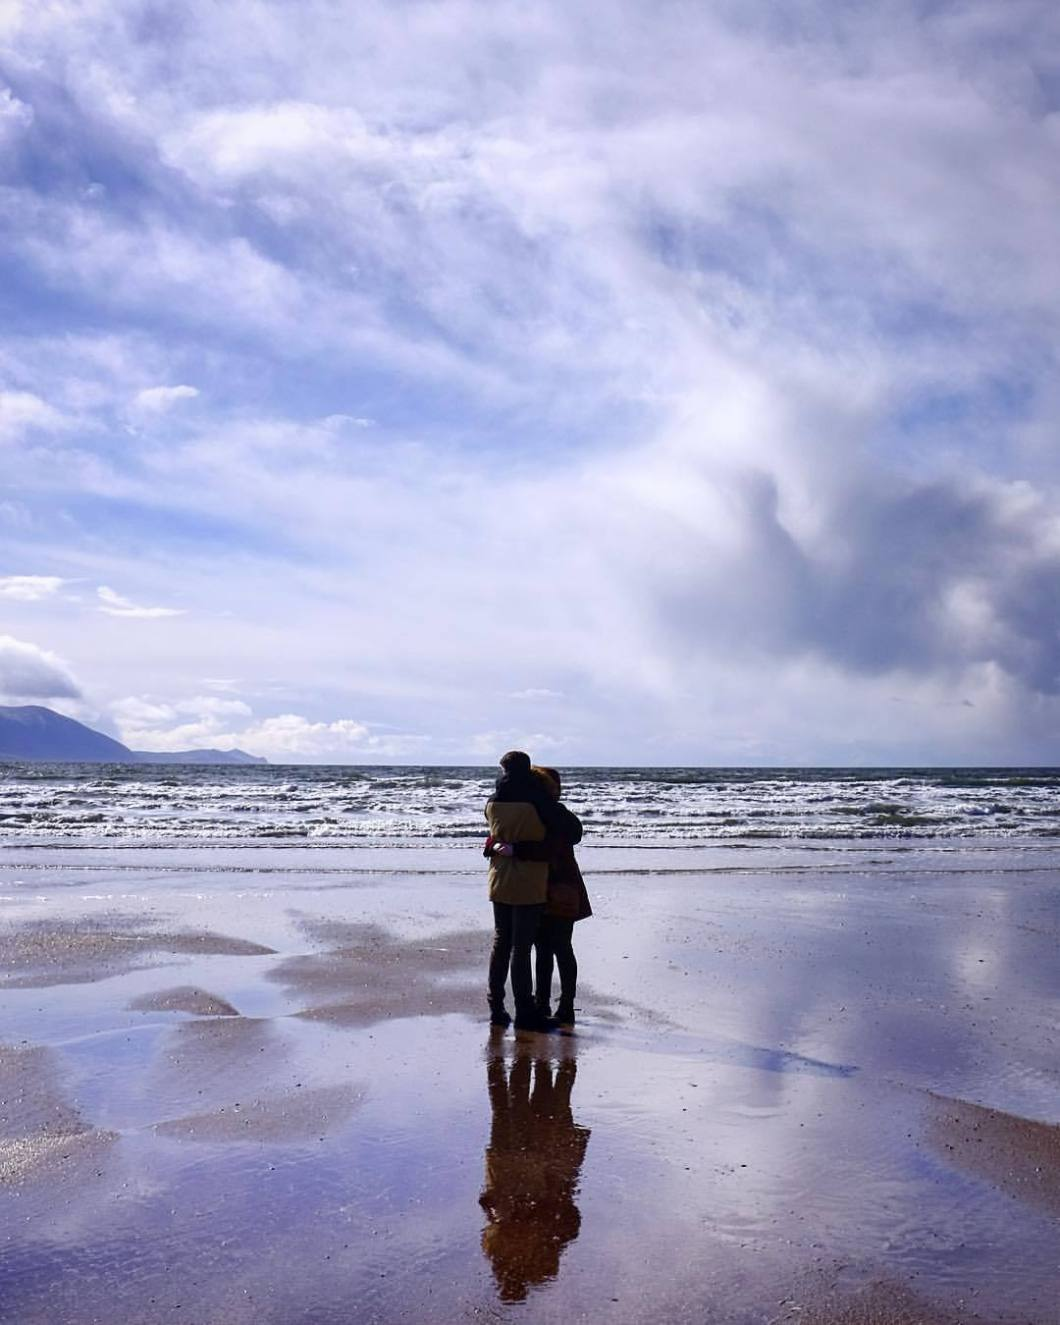 Blue sands. Ireland, 2018..#photooftheday #onephotoaday #photography #fujix100t #beach #ireland #eire #free #freedom #sea #ocean #seaside #bluesand #love #couple #clouds #sun #kerry #portmagee (hier: Kerry, Ireland)